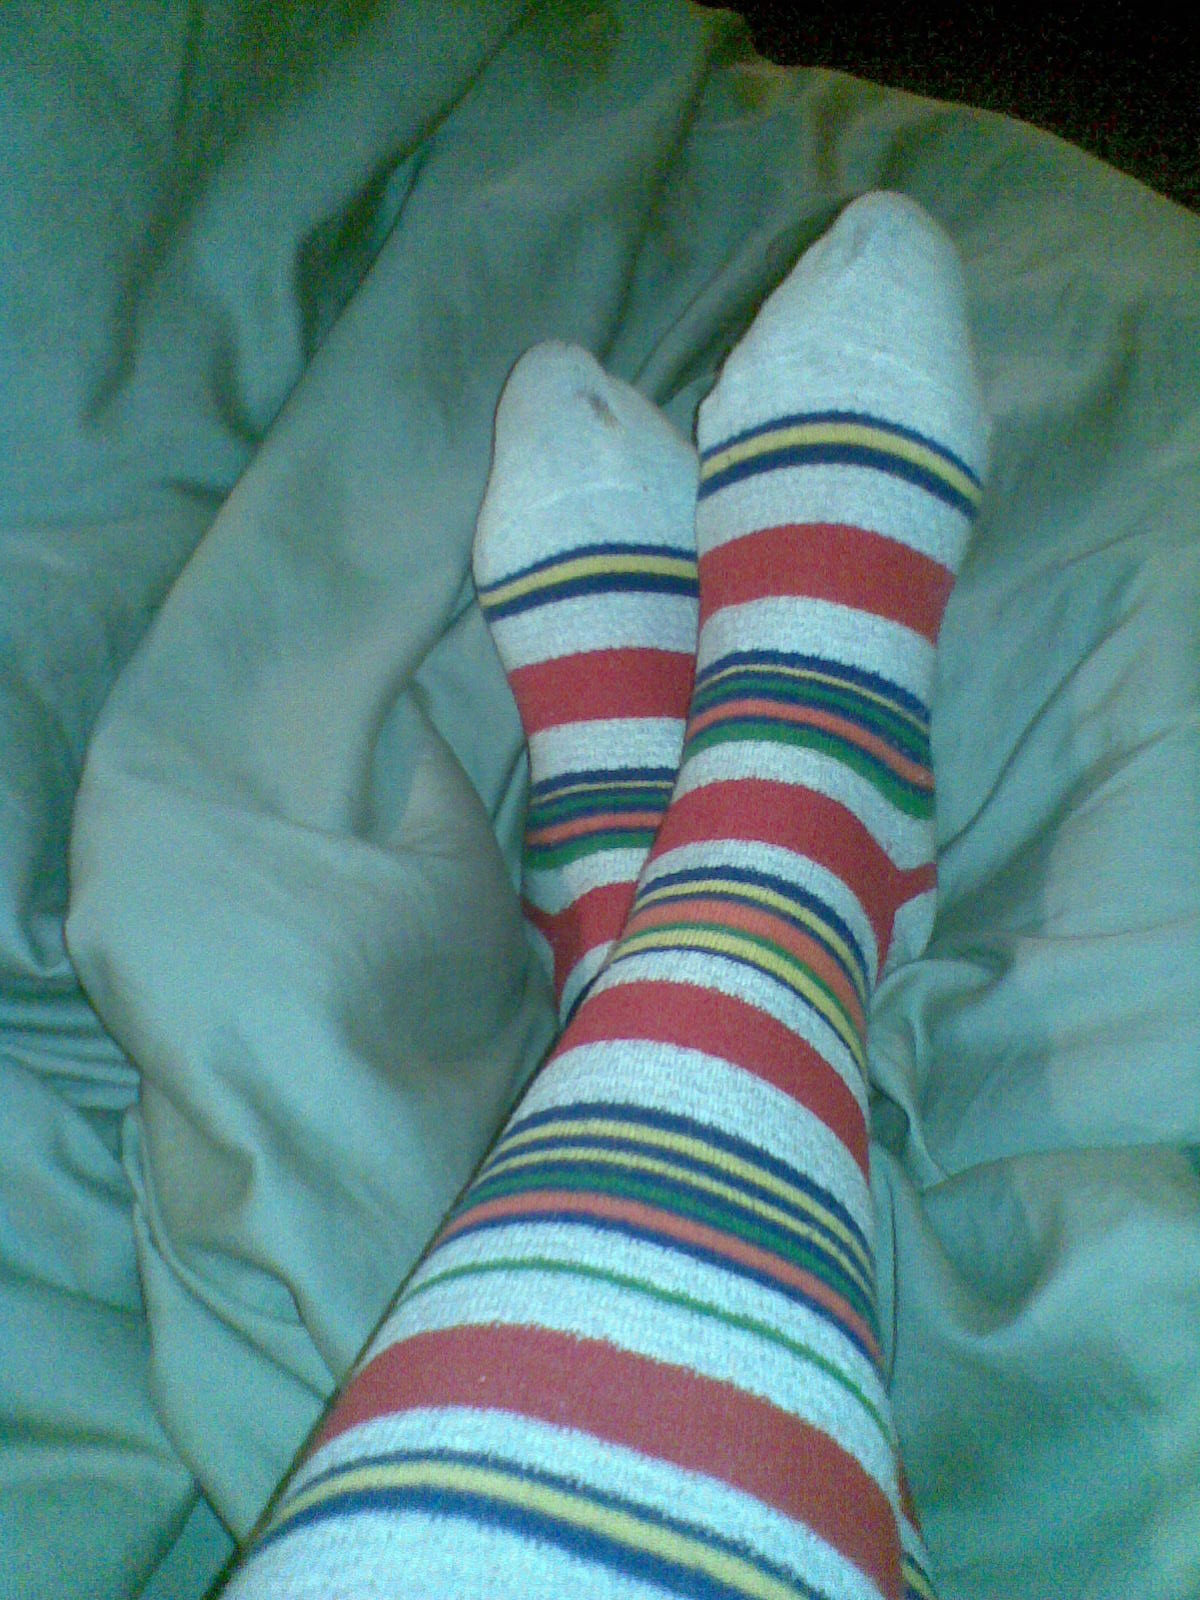 sukkikset jalassa Kalajoki